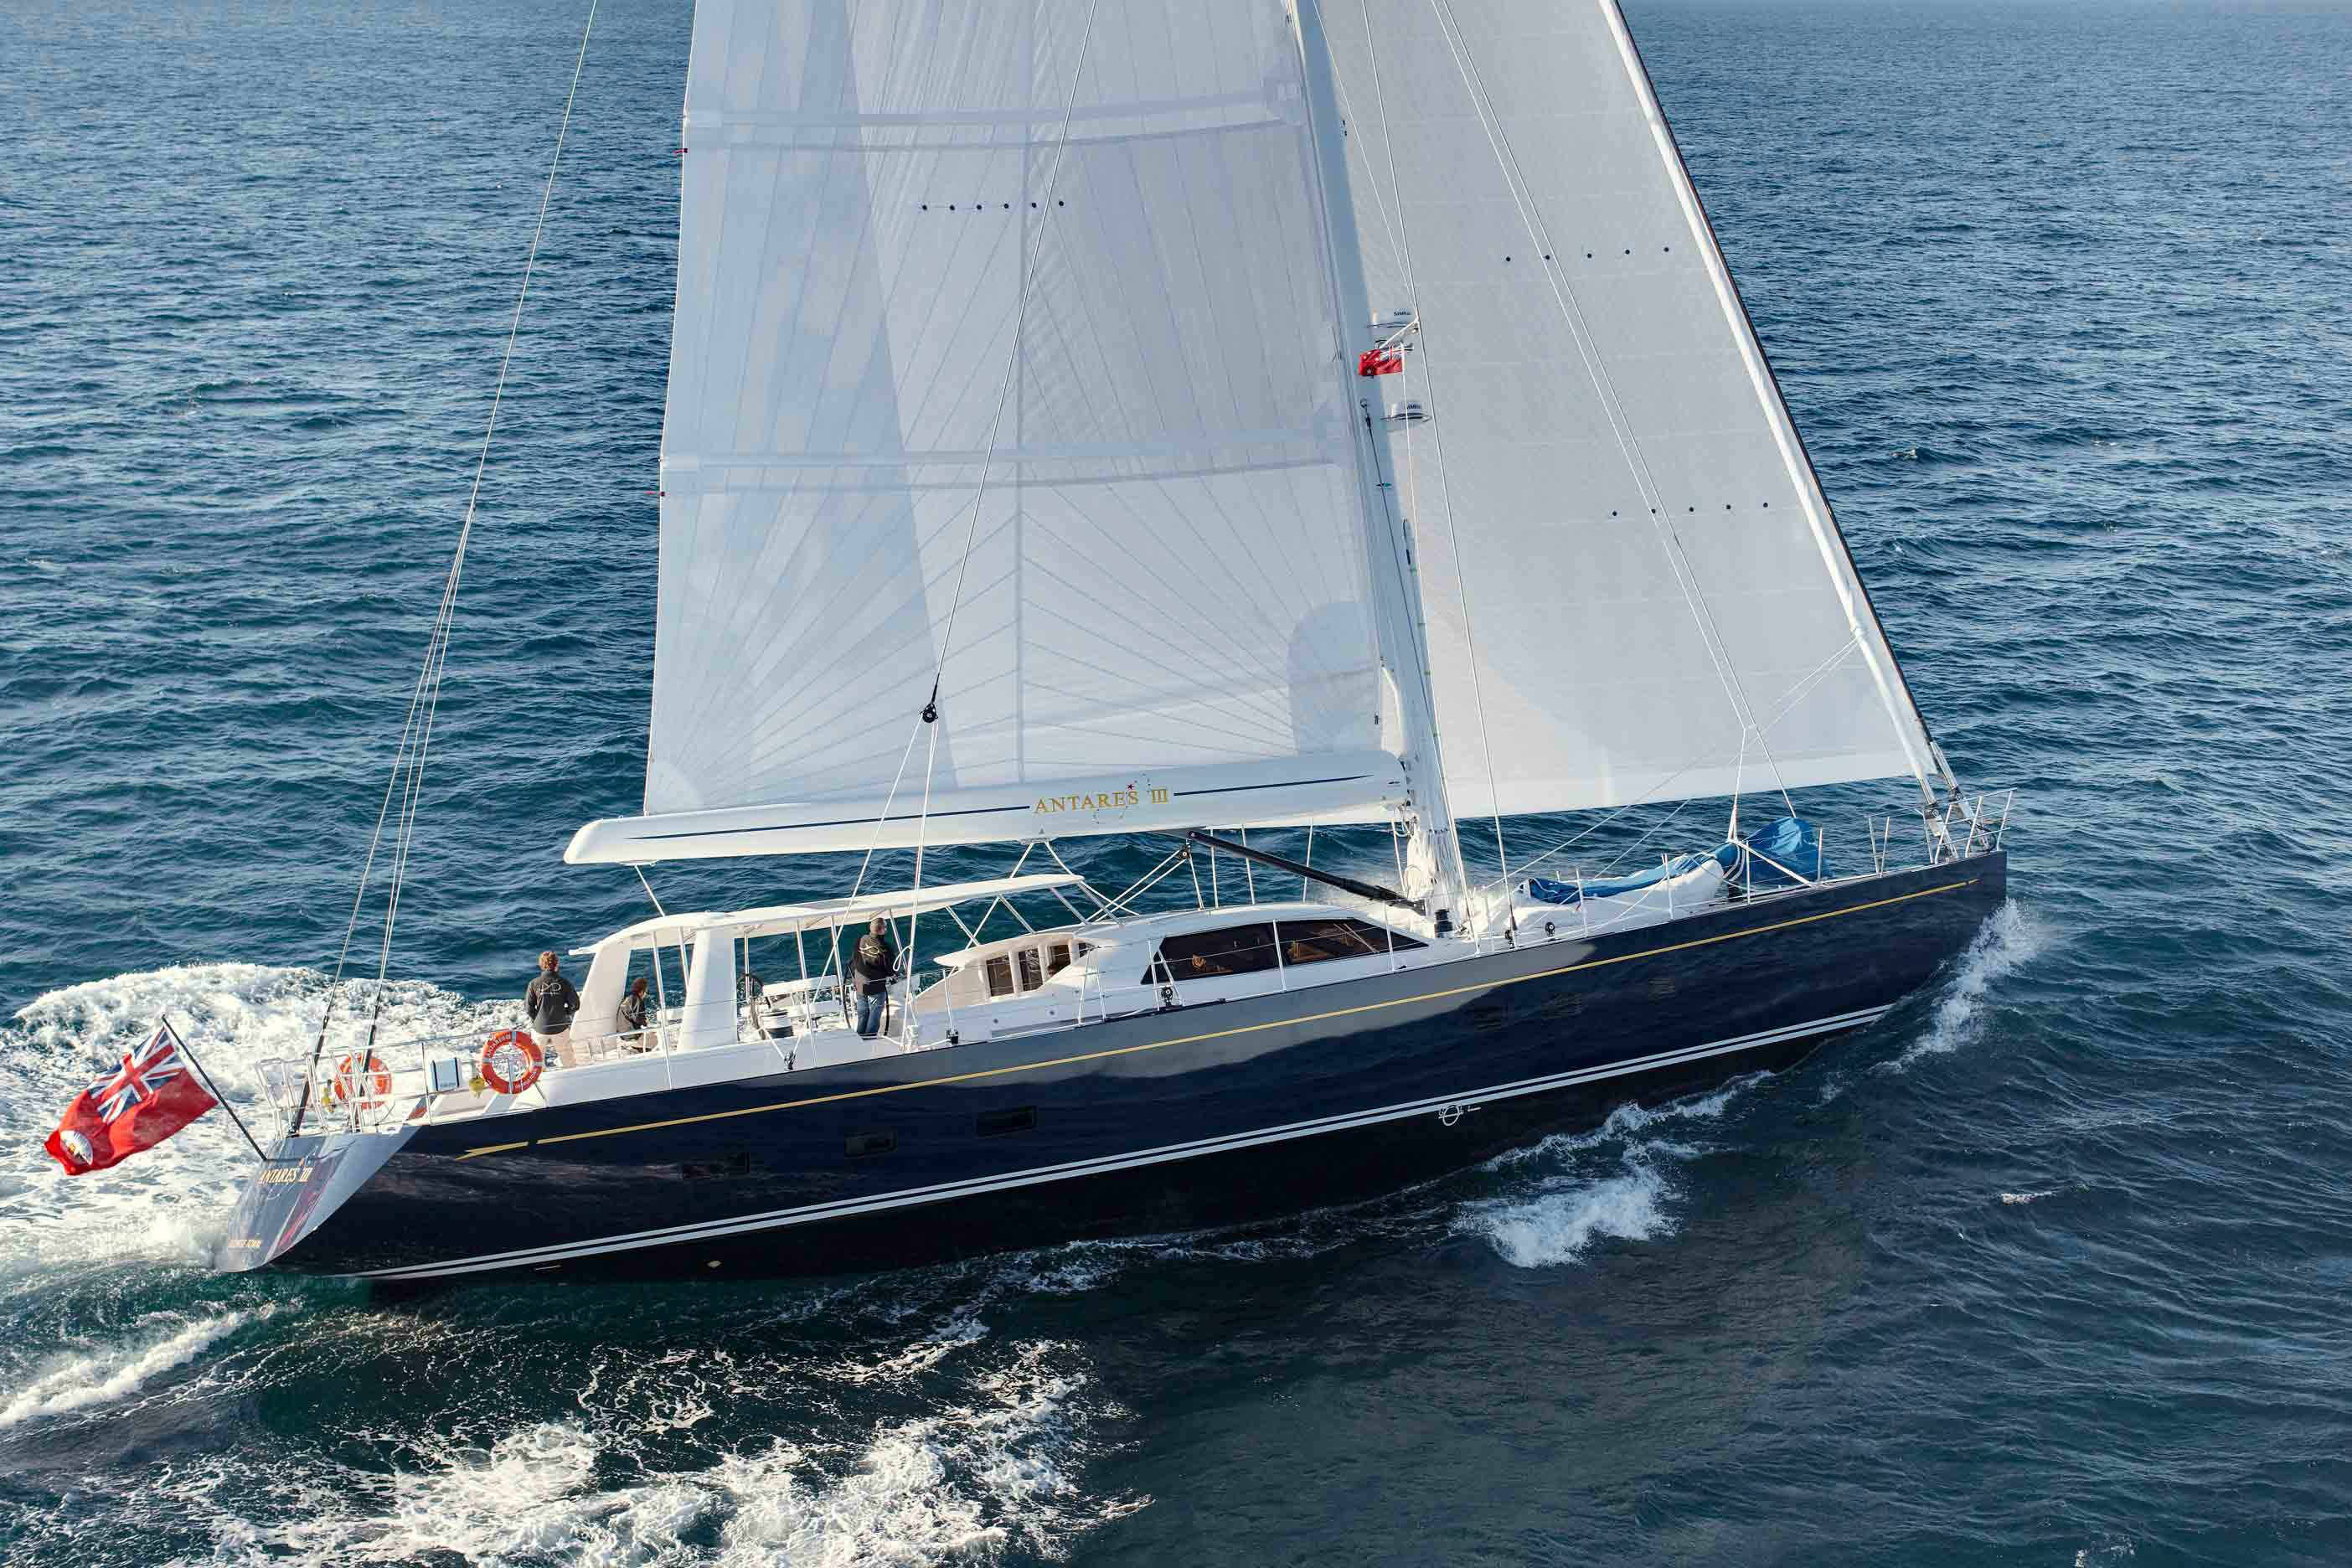 Sailing Yacht Antares III Yacht Charter Amp Superyacht News